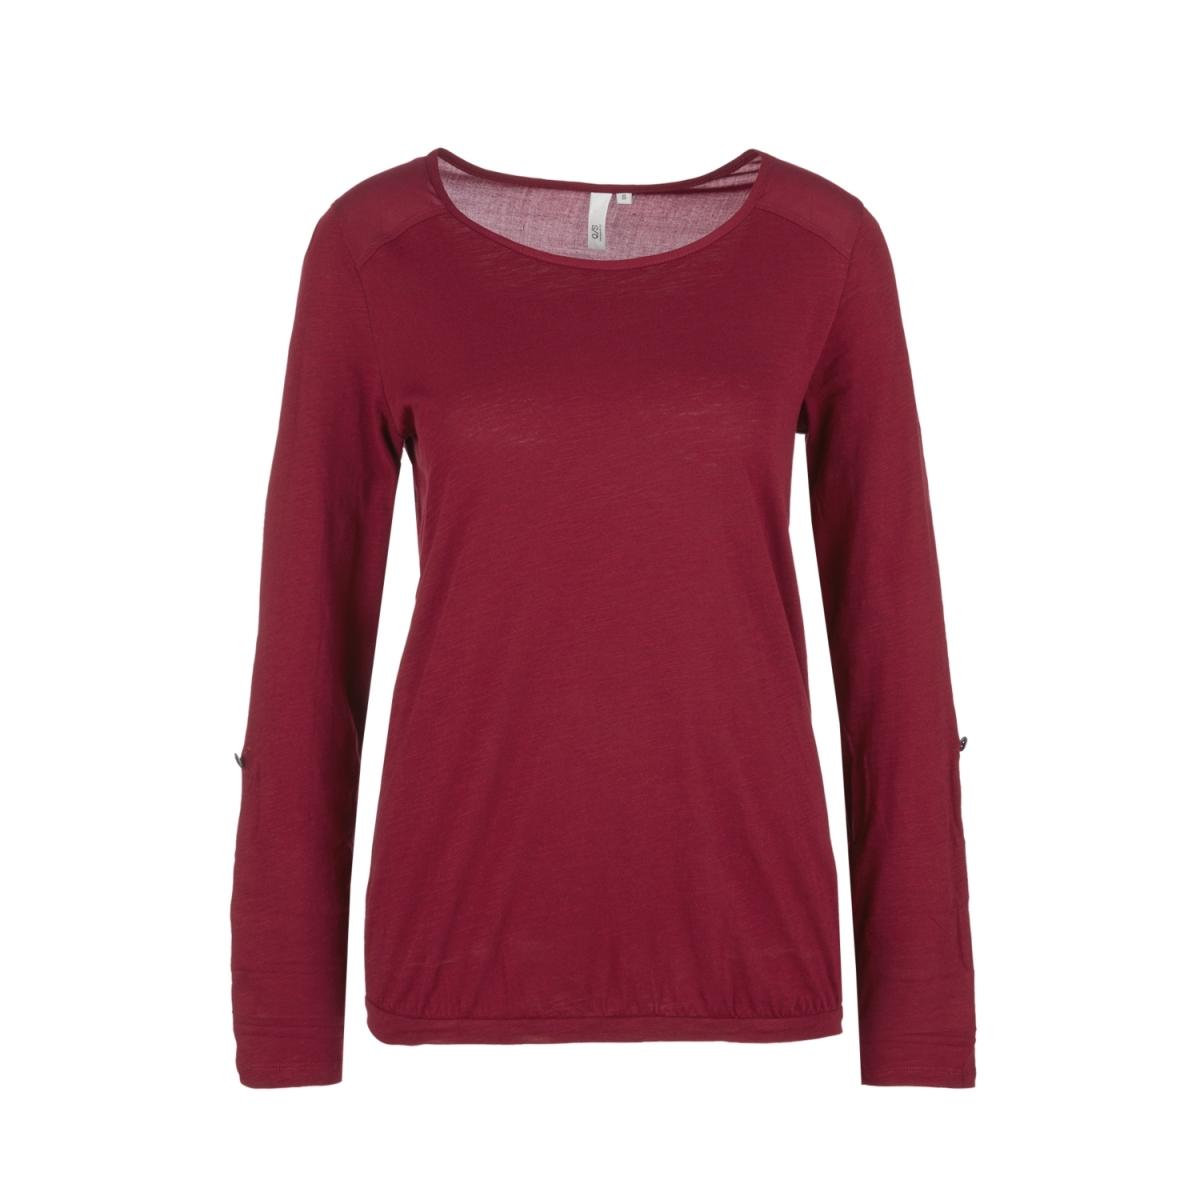 shirt met oprolbare mouwen 45899313170 q/s designed by t-shirt 3930